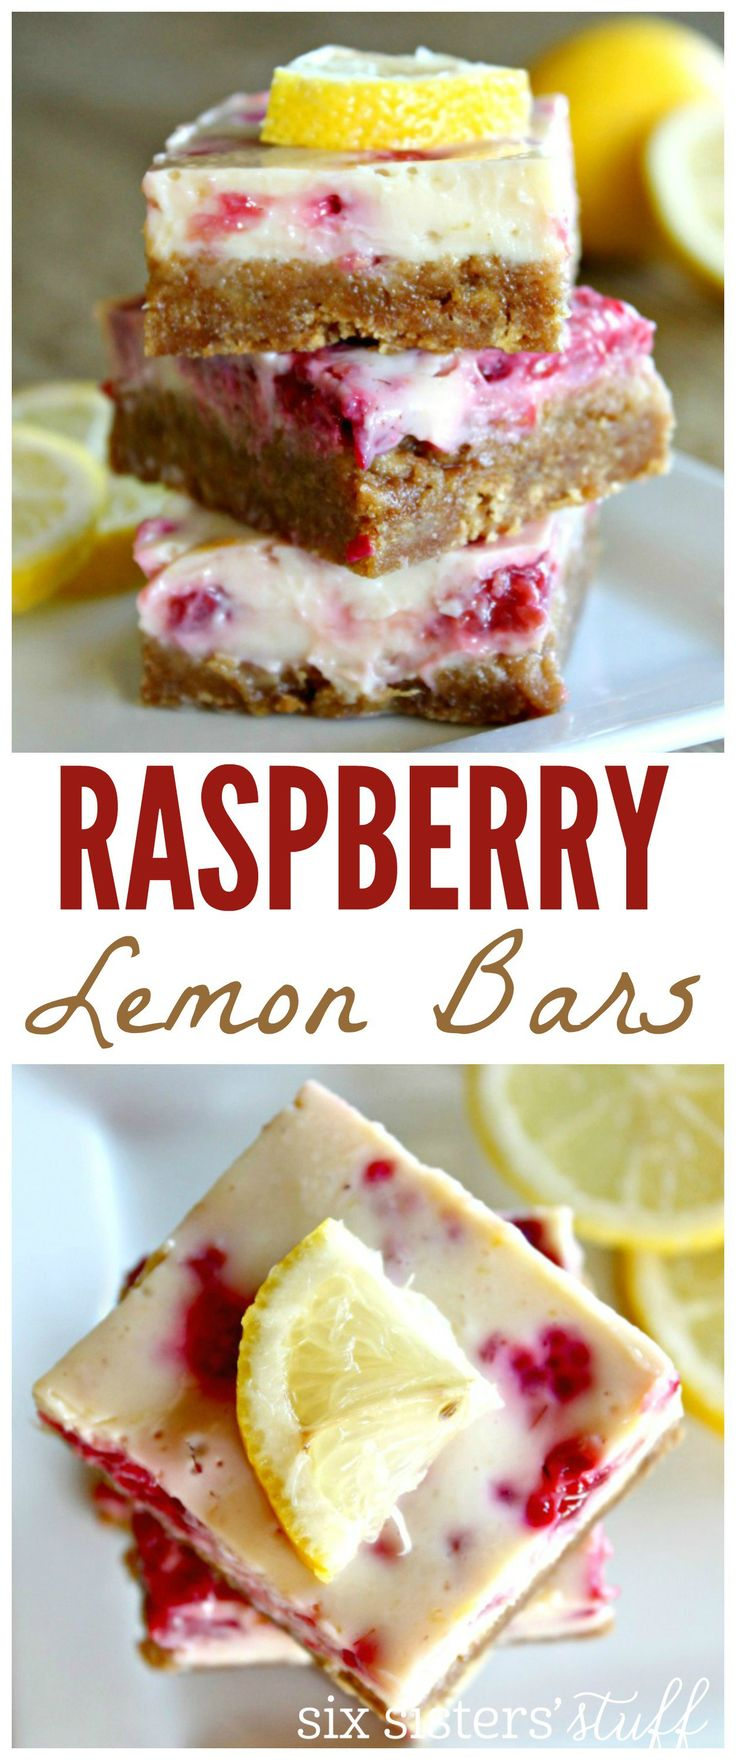 Raspberry Lemon Bars by Six Sisters' Stuff